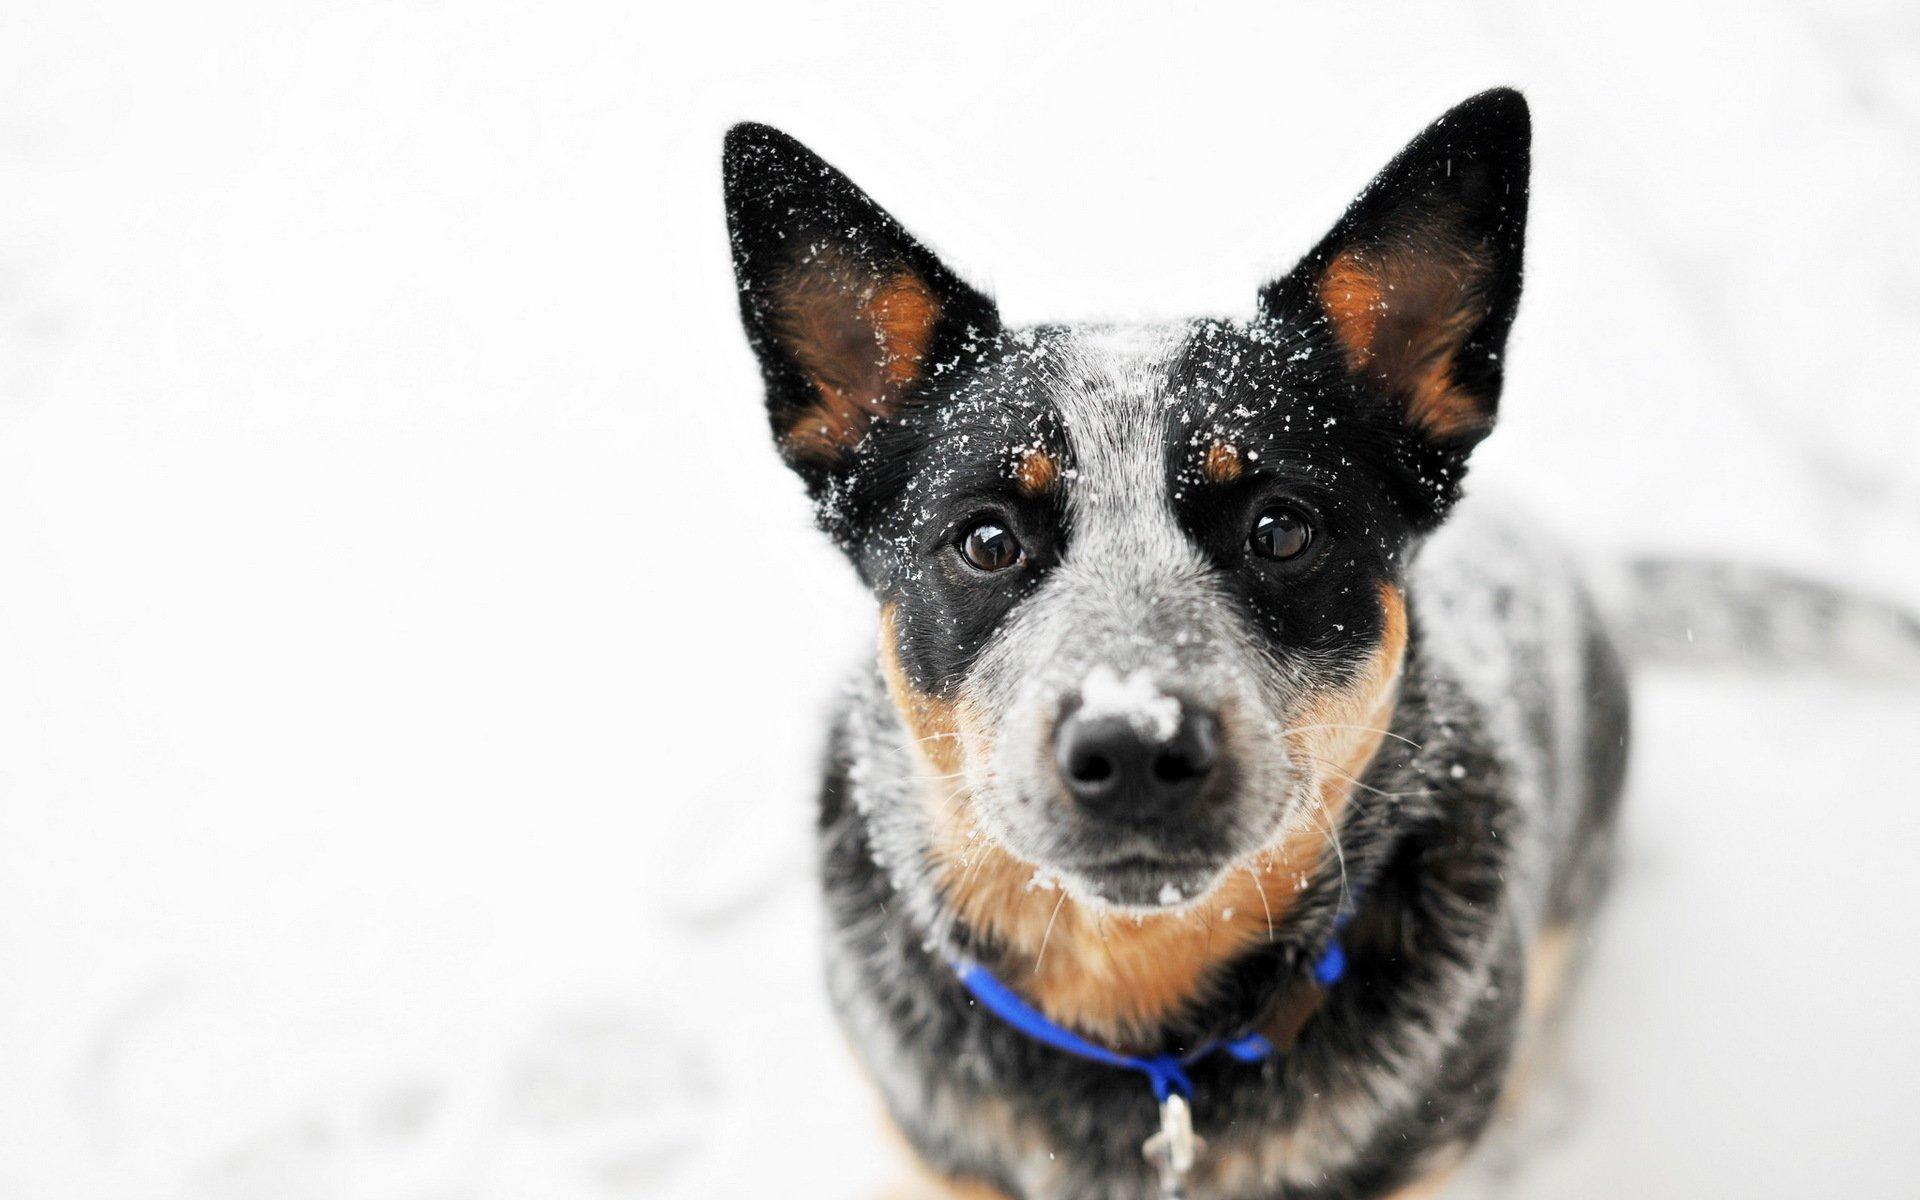 General 1920x1200 dog australian cattle dog snow looking at viewer good boy